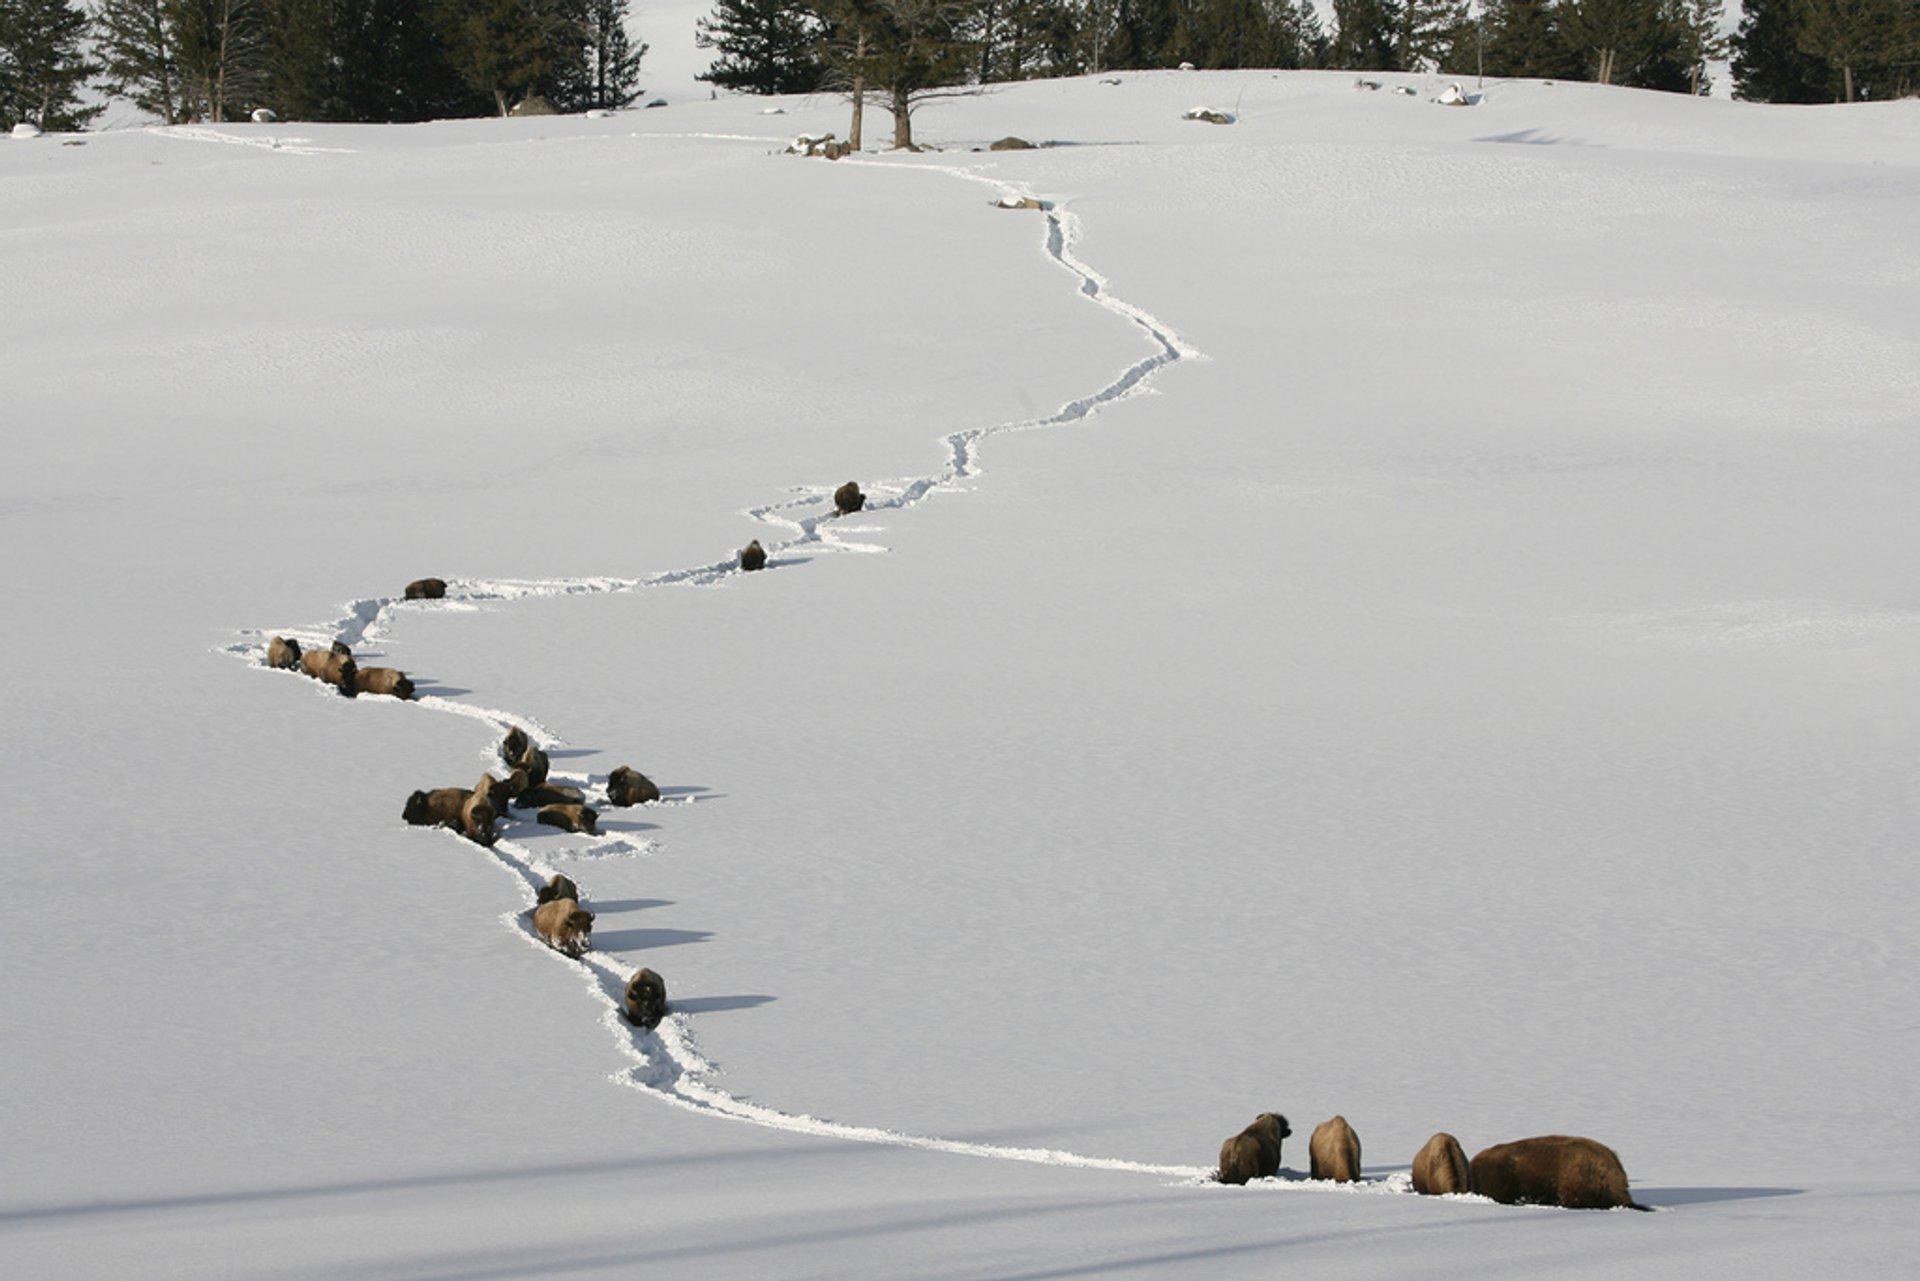 Bison walking through deep snow near Tower Jct. 2019